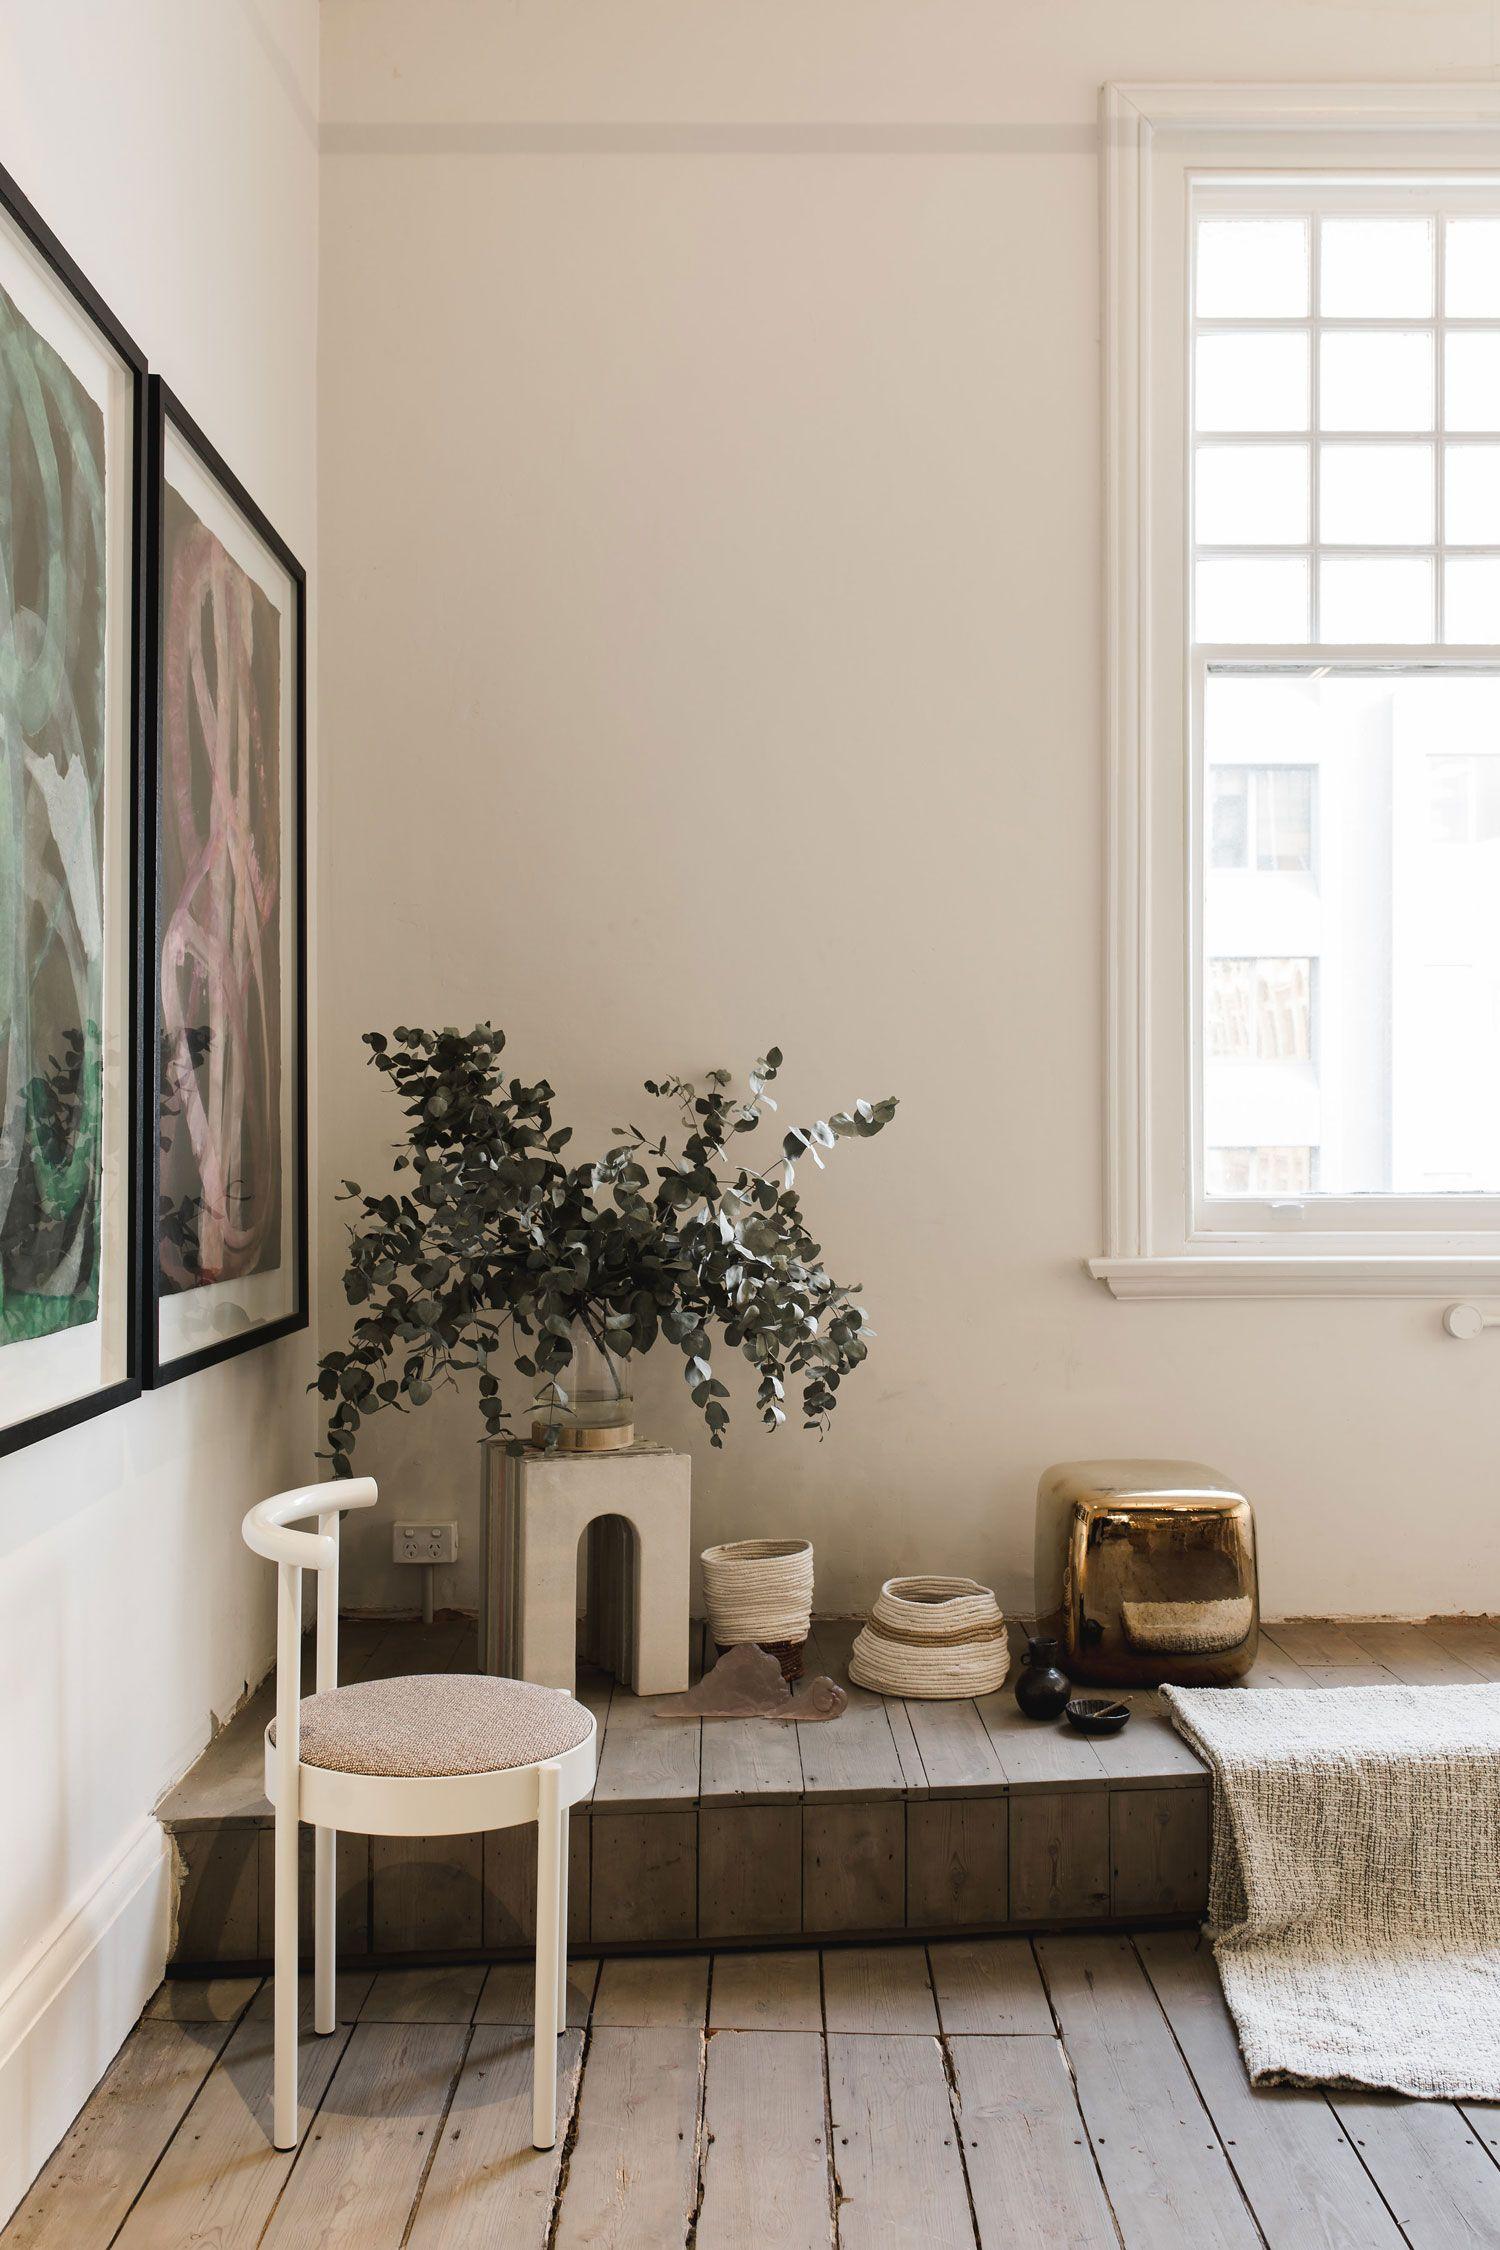 Williams burton leopardi studio leibal minimalist kitchen tiles minimalist interior minimalist home